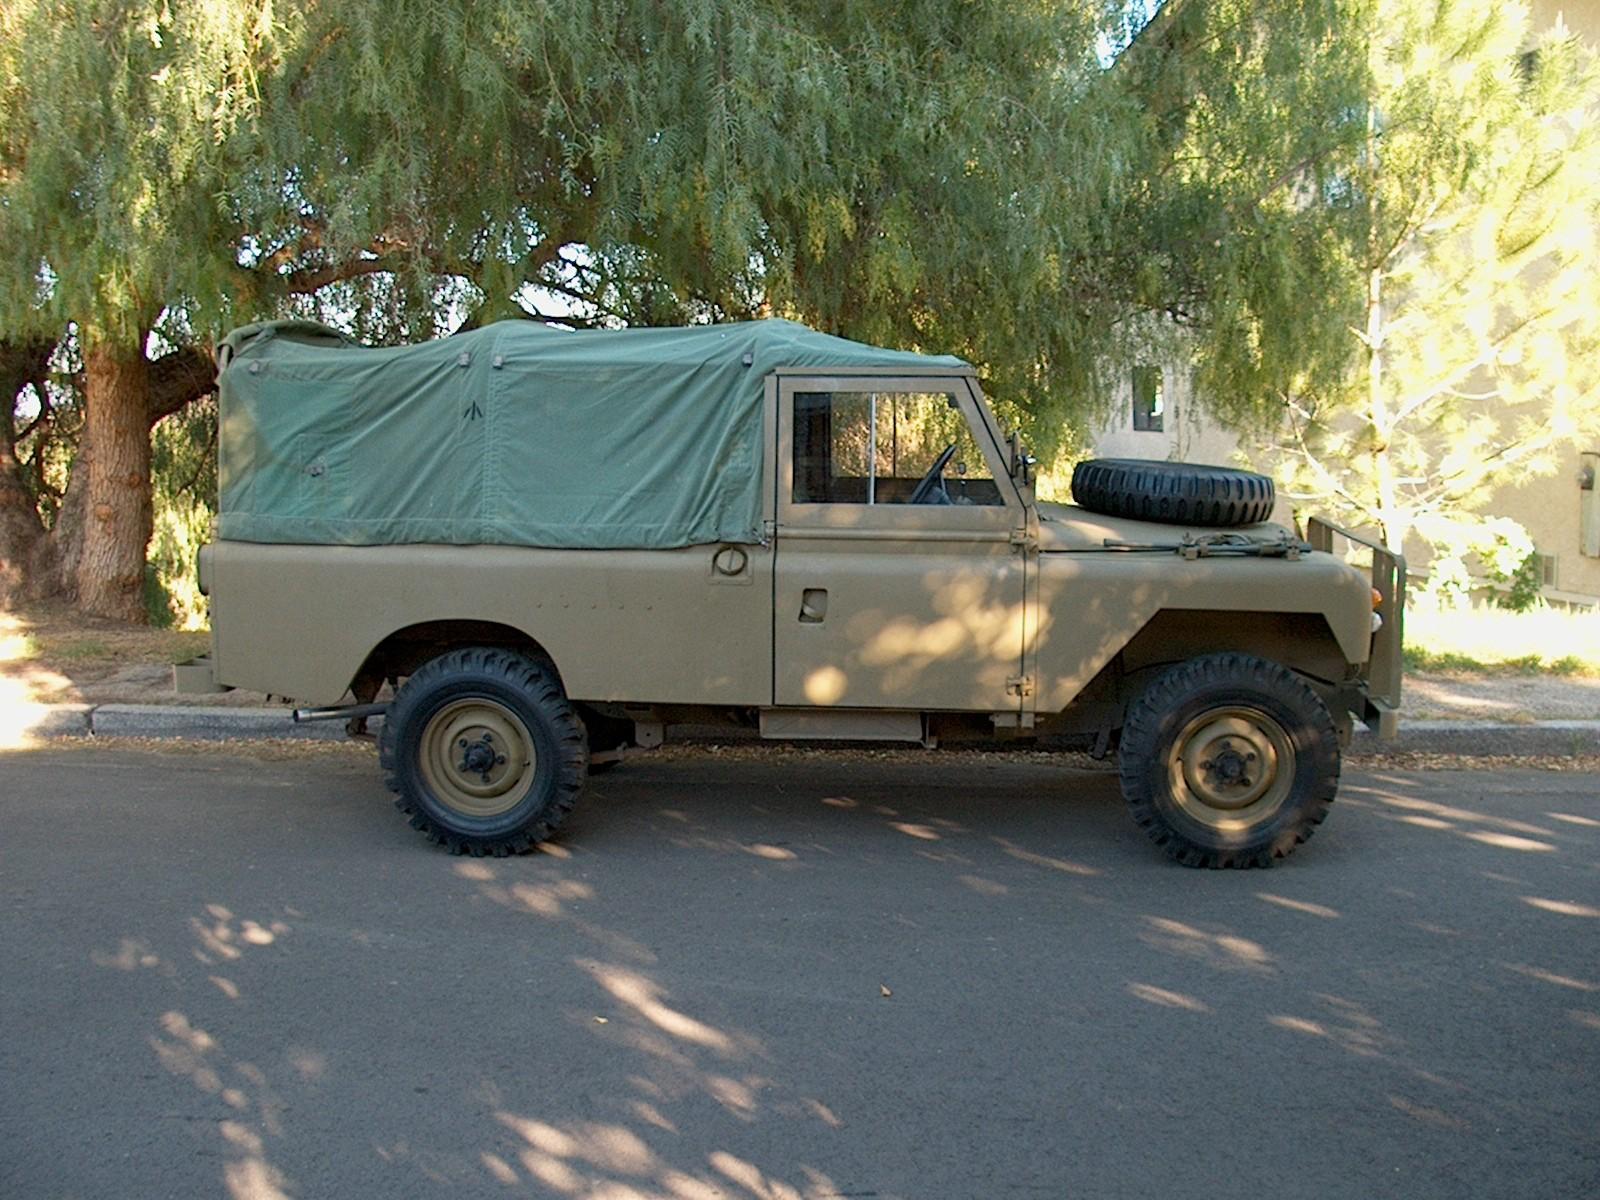 guard off index premium landmark discovery brush ext desktop rover road land vehicles suv landrover